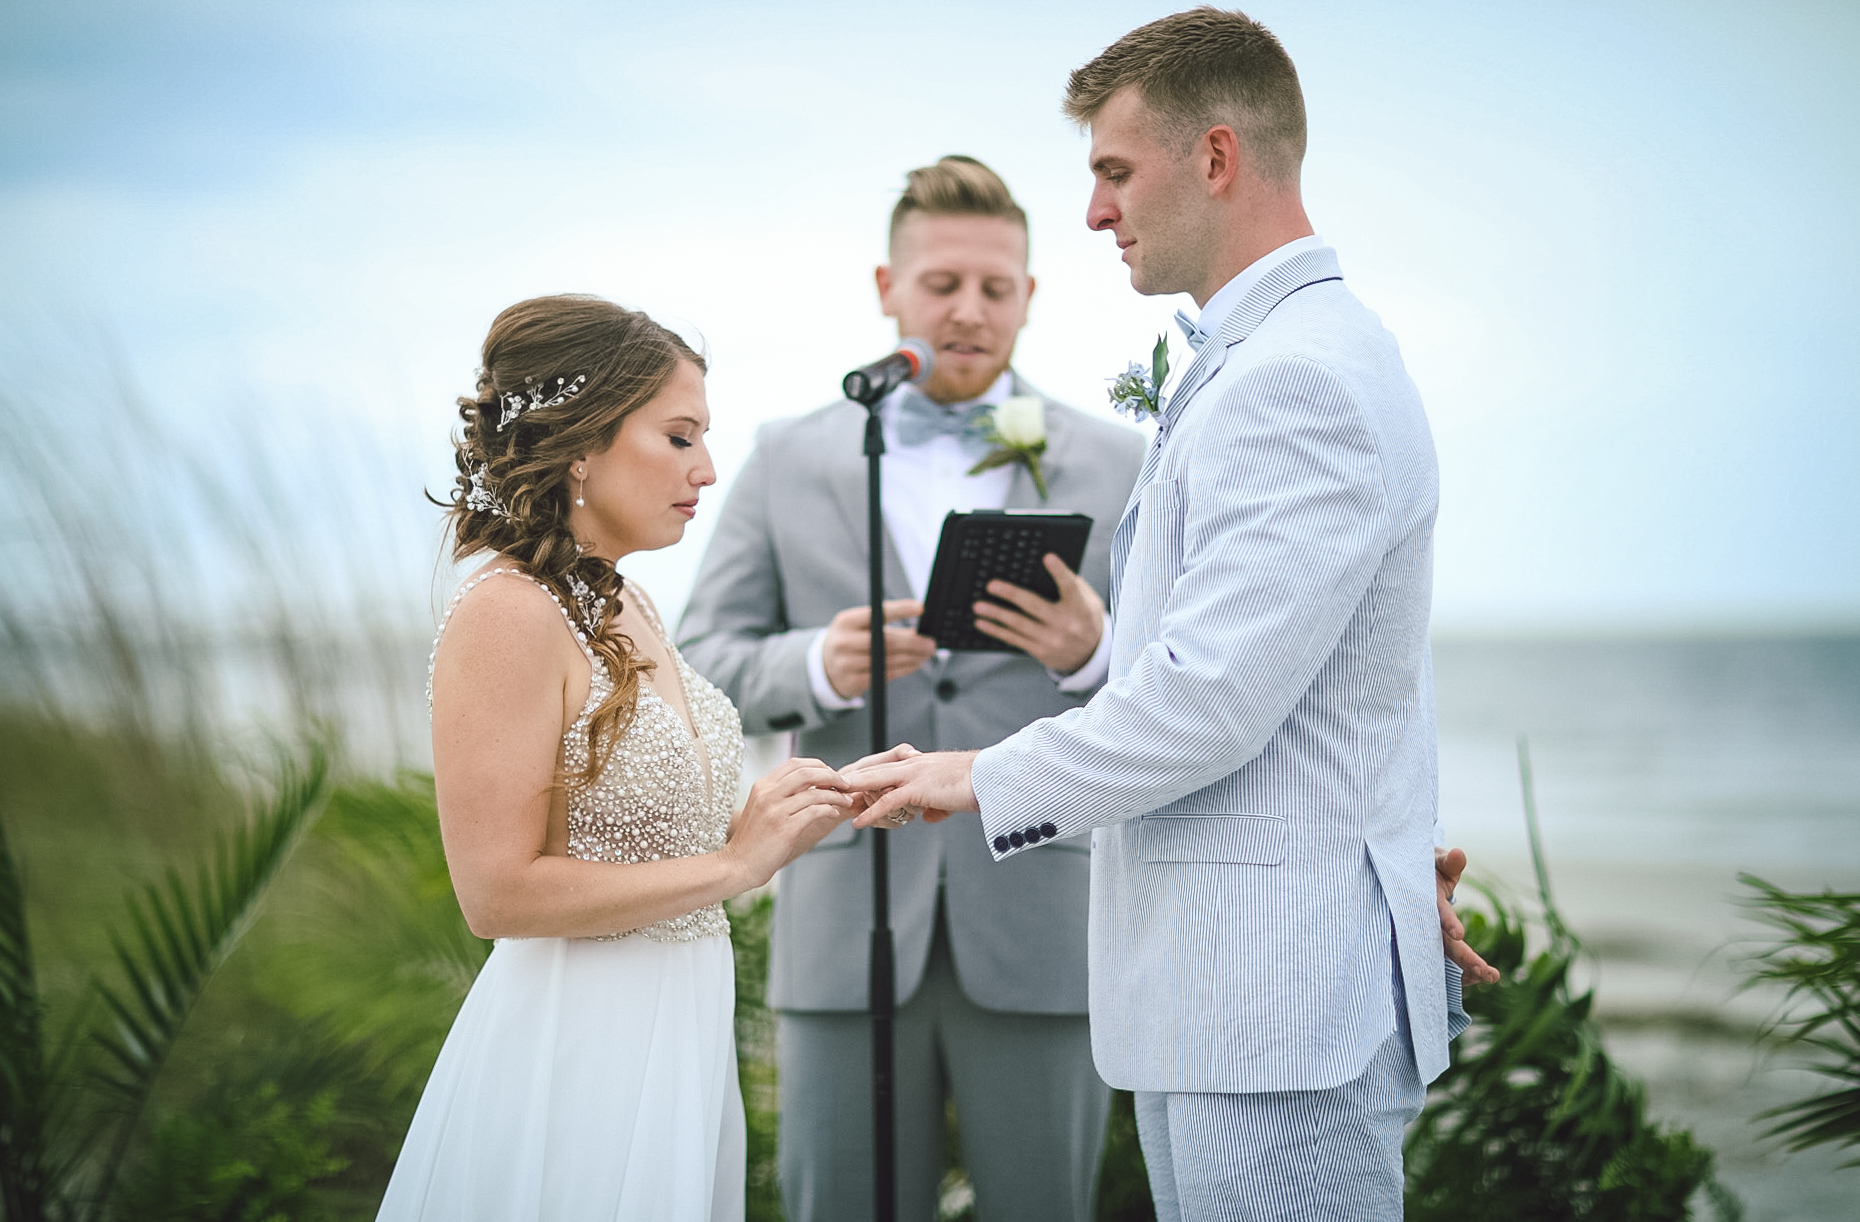 hilton-head-island-wedding-sc-ceremony114.jpg